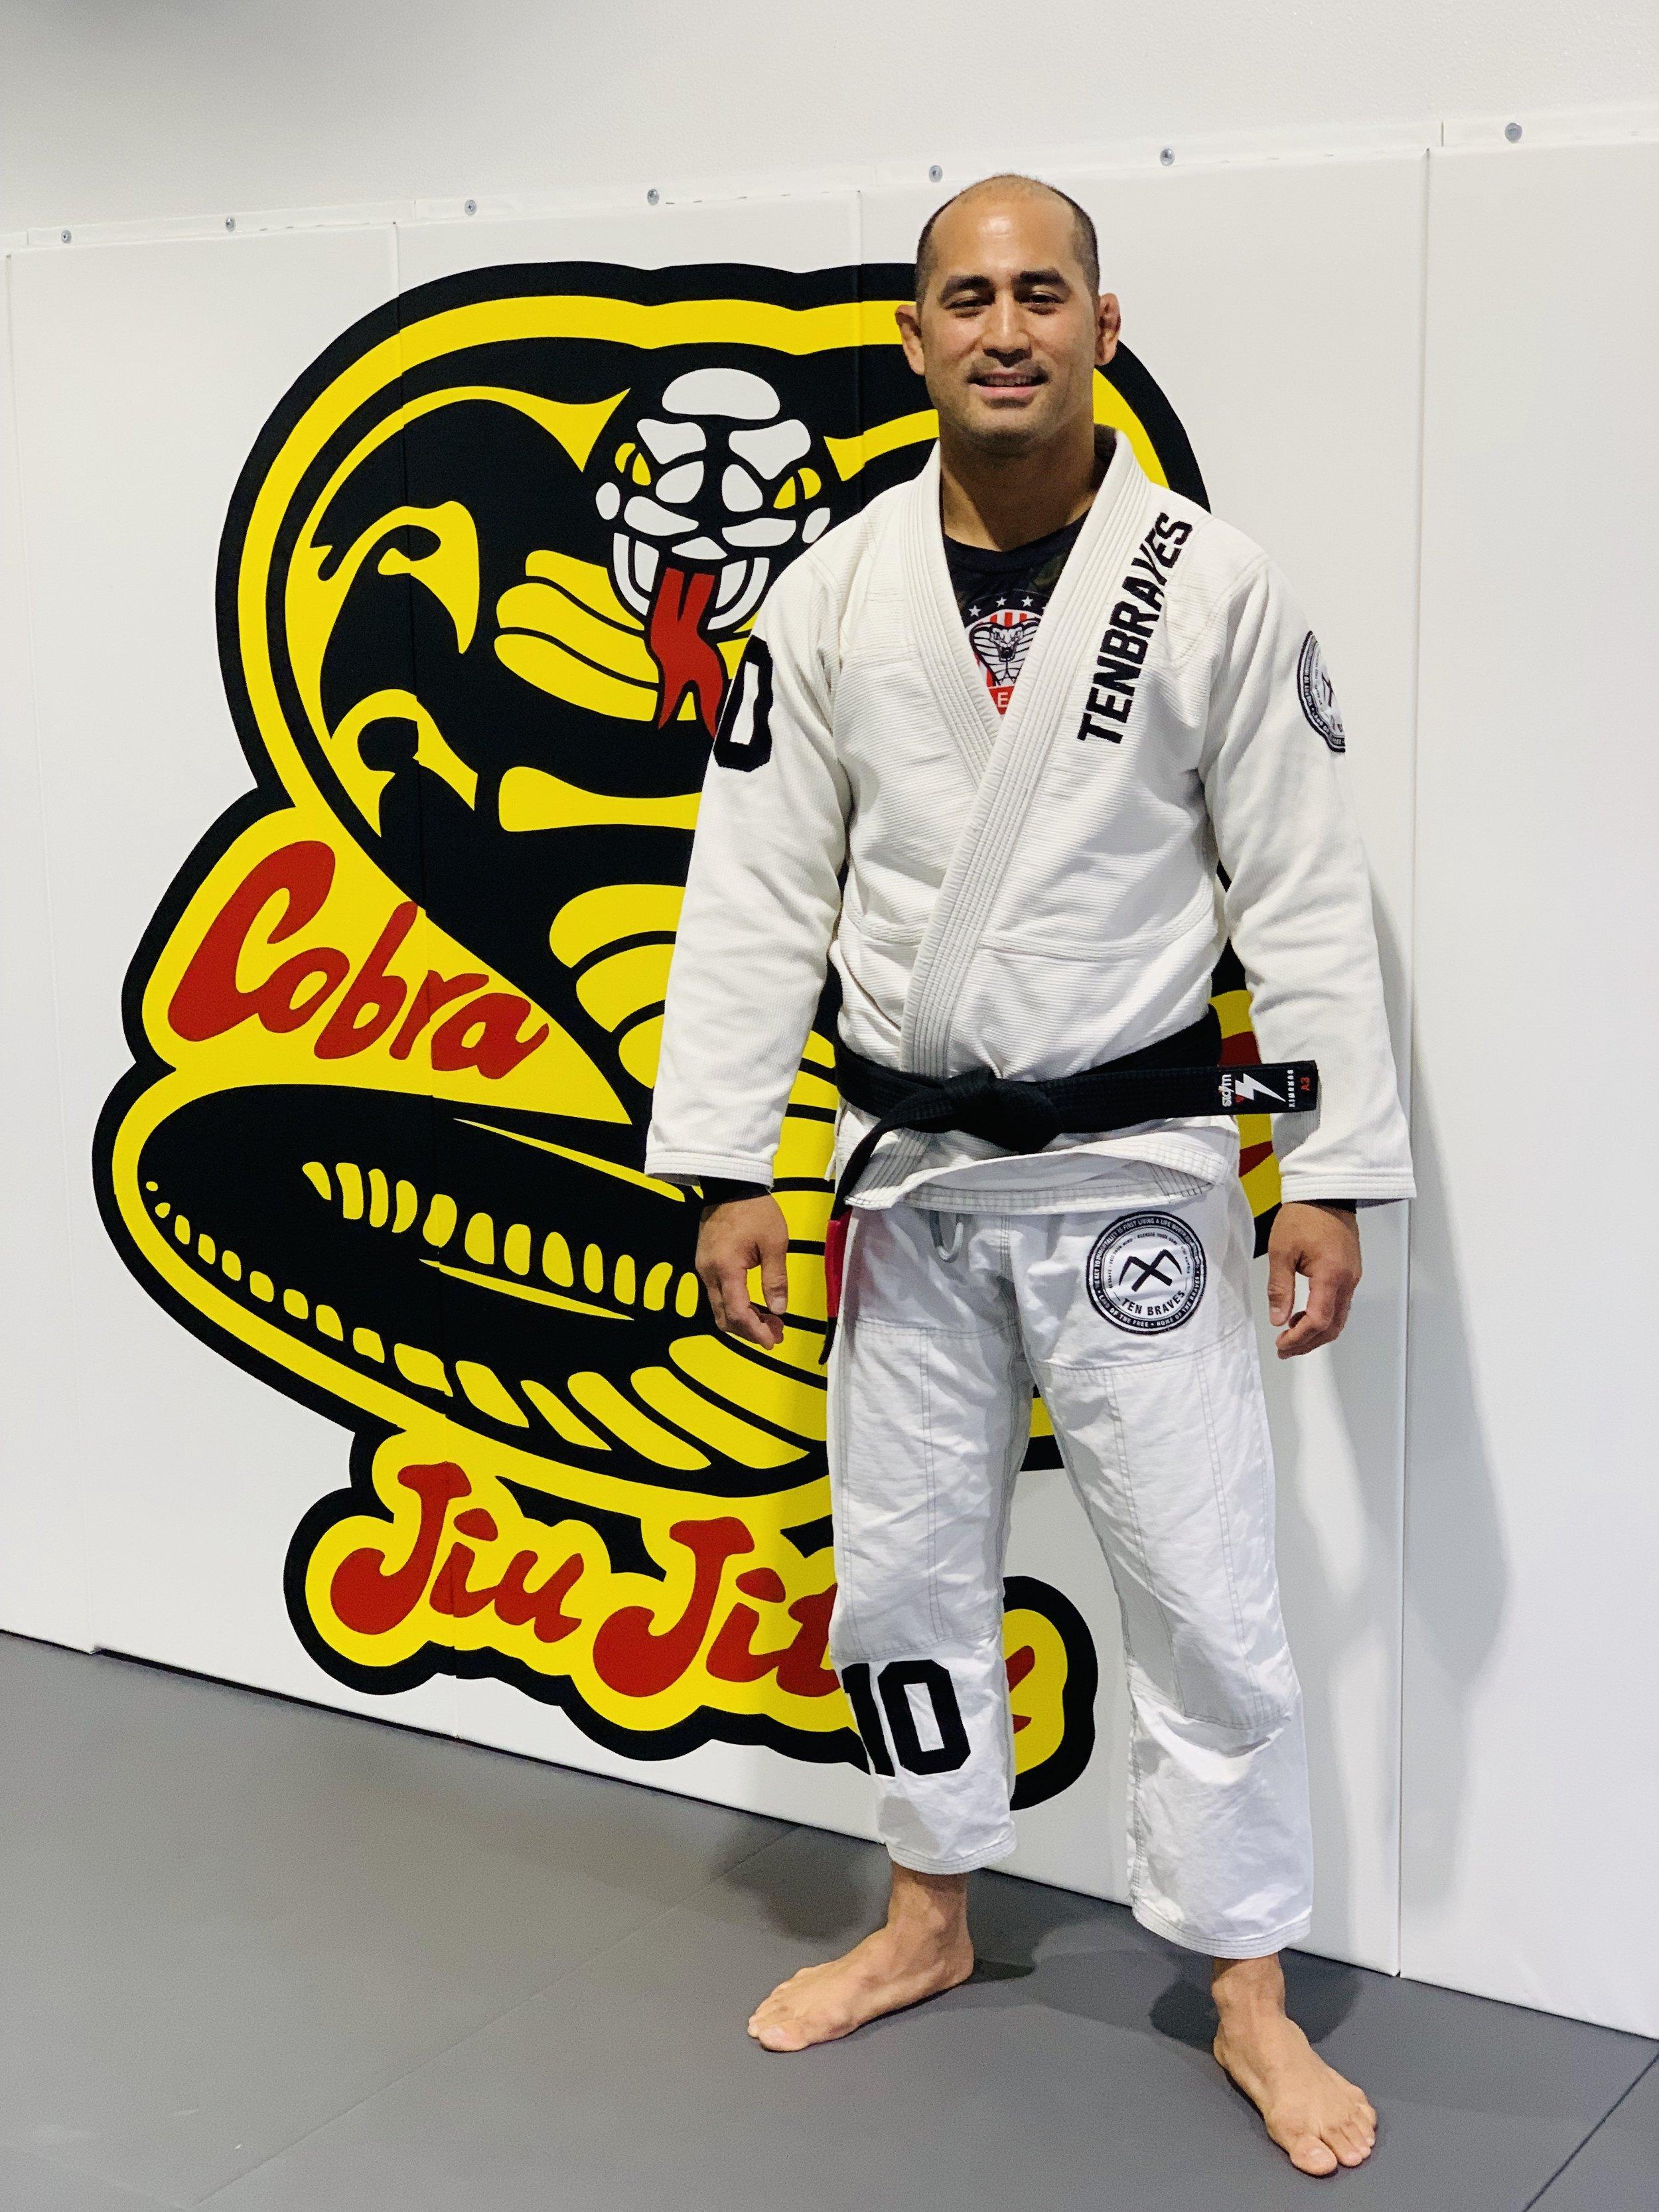 Ryan Antenorcruz   Black Belt